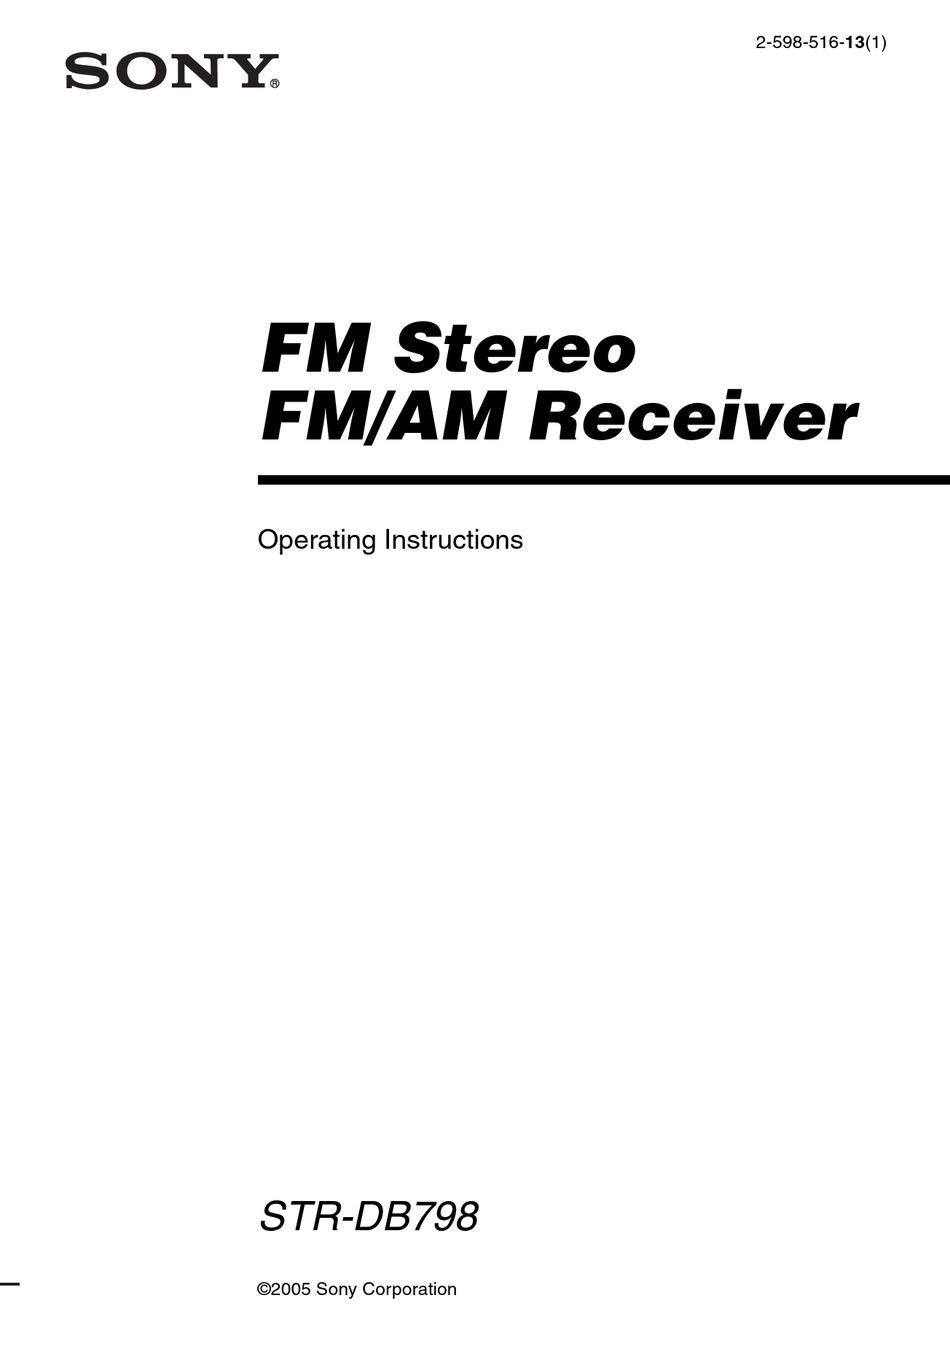 SONY STR-DB798 OPERATING INSTRUCTIONS MANUAL Pdf Download